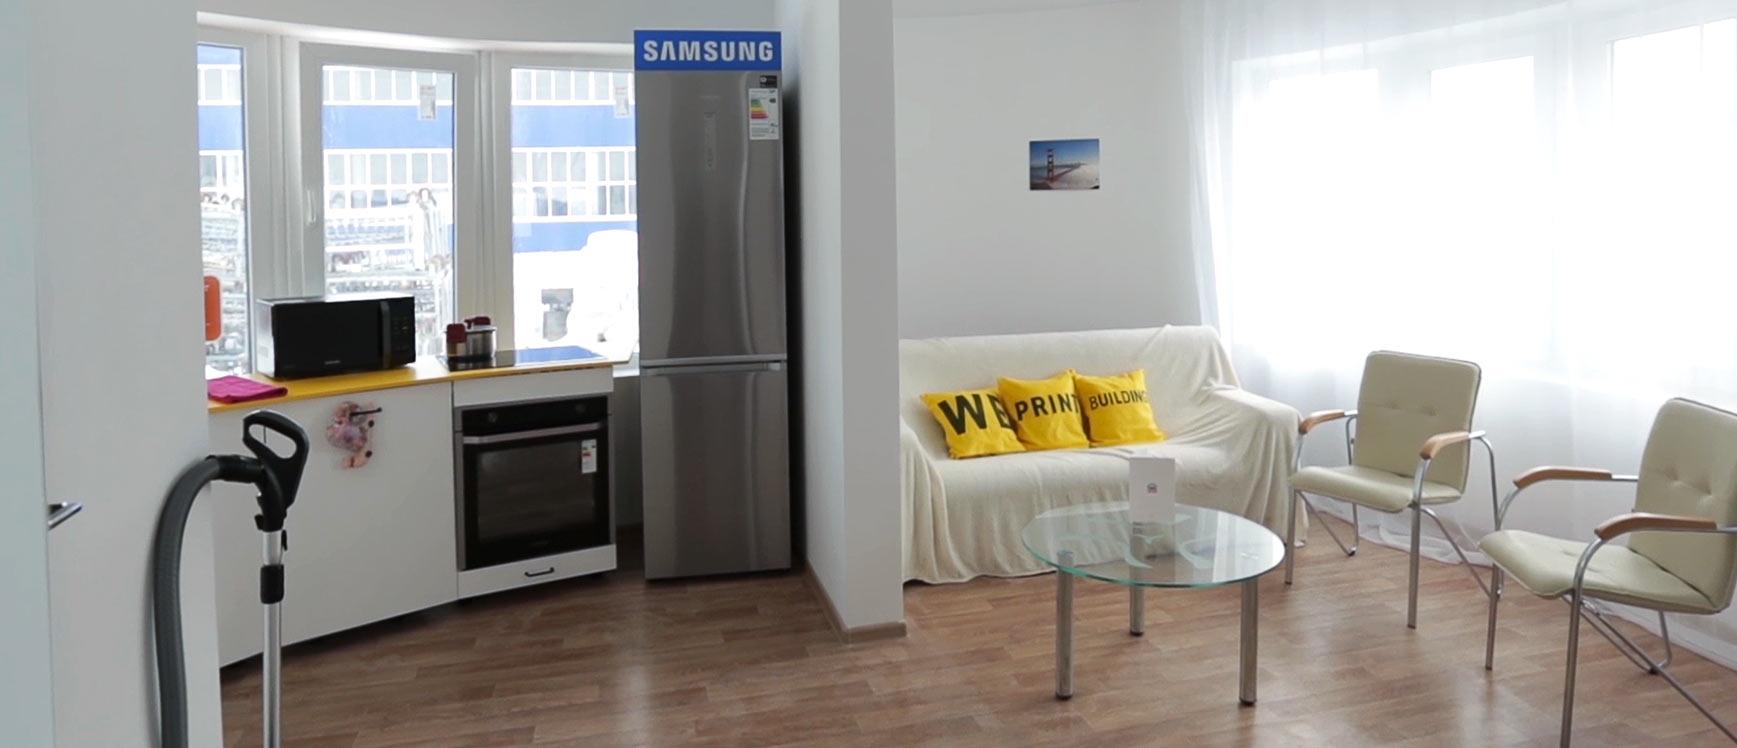 ApisCor-3D-Printed-House-Complete-Interior-1